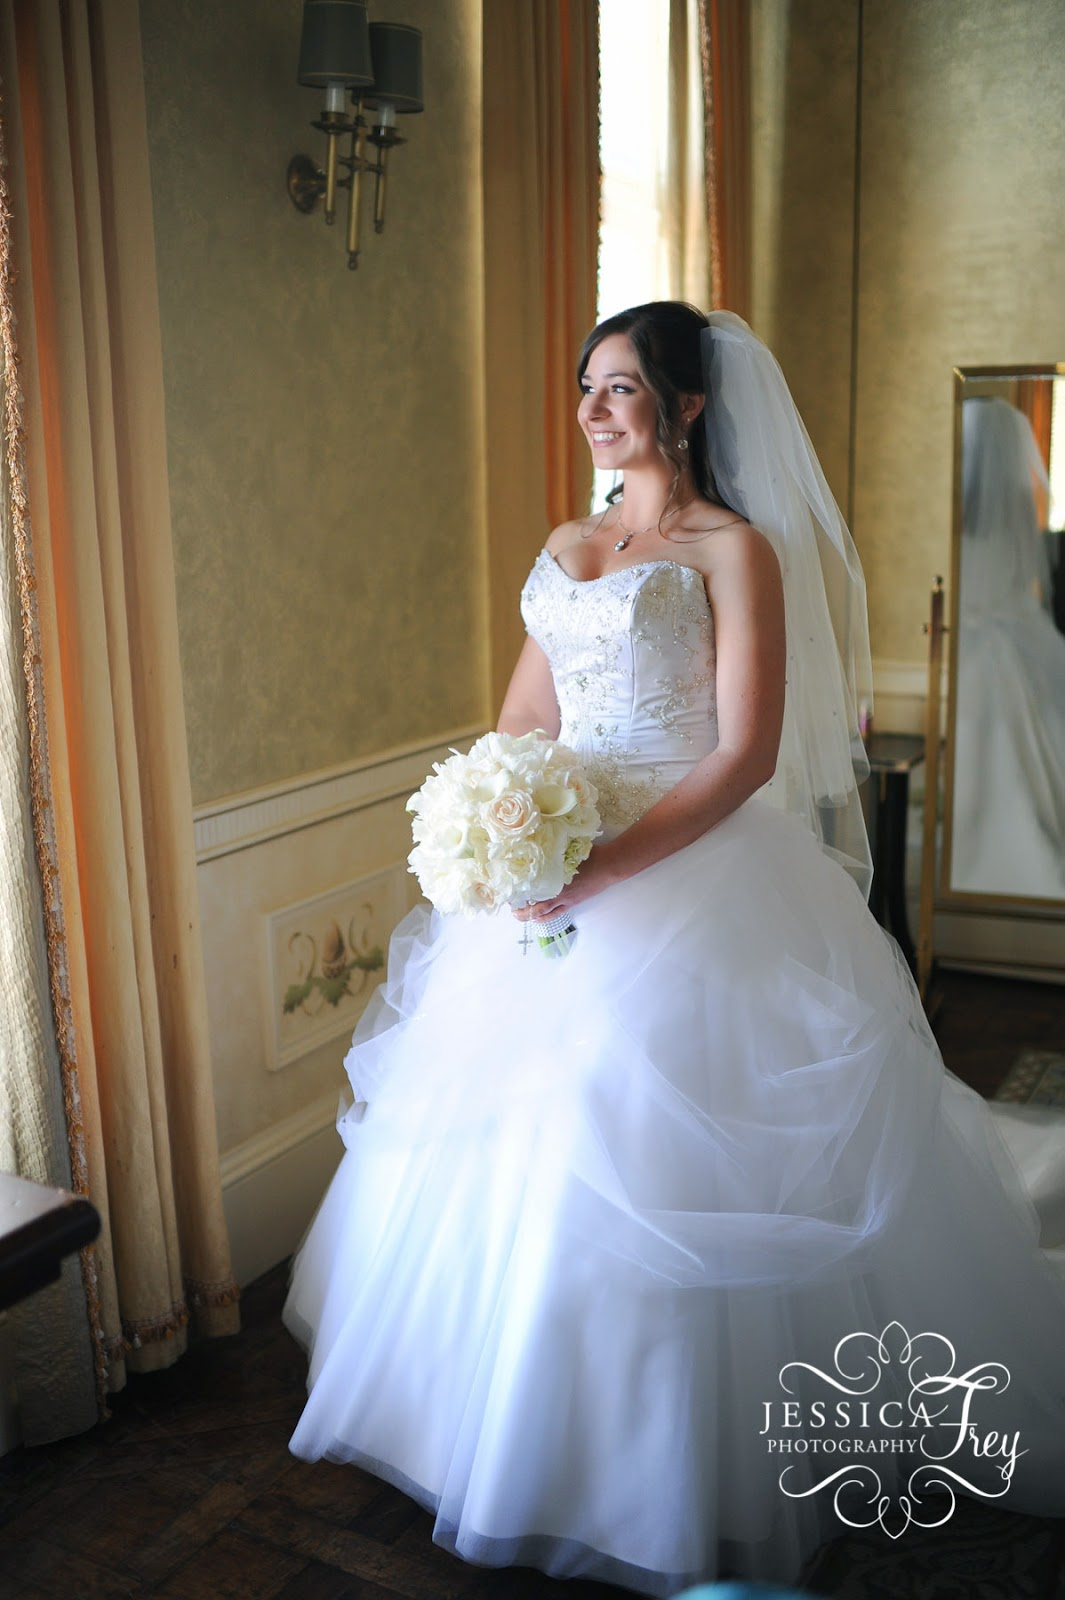 Beauty And The Beast Wedding Dress: A 'Beauty And The Beast' Wedding